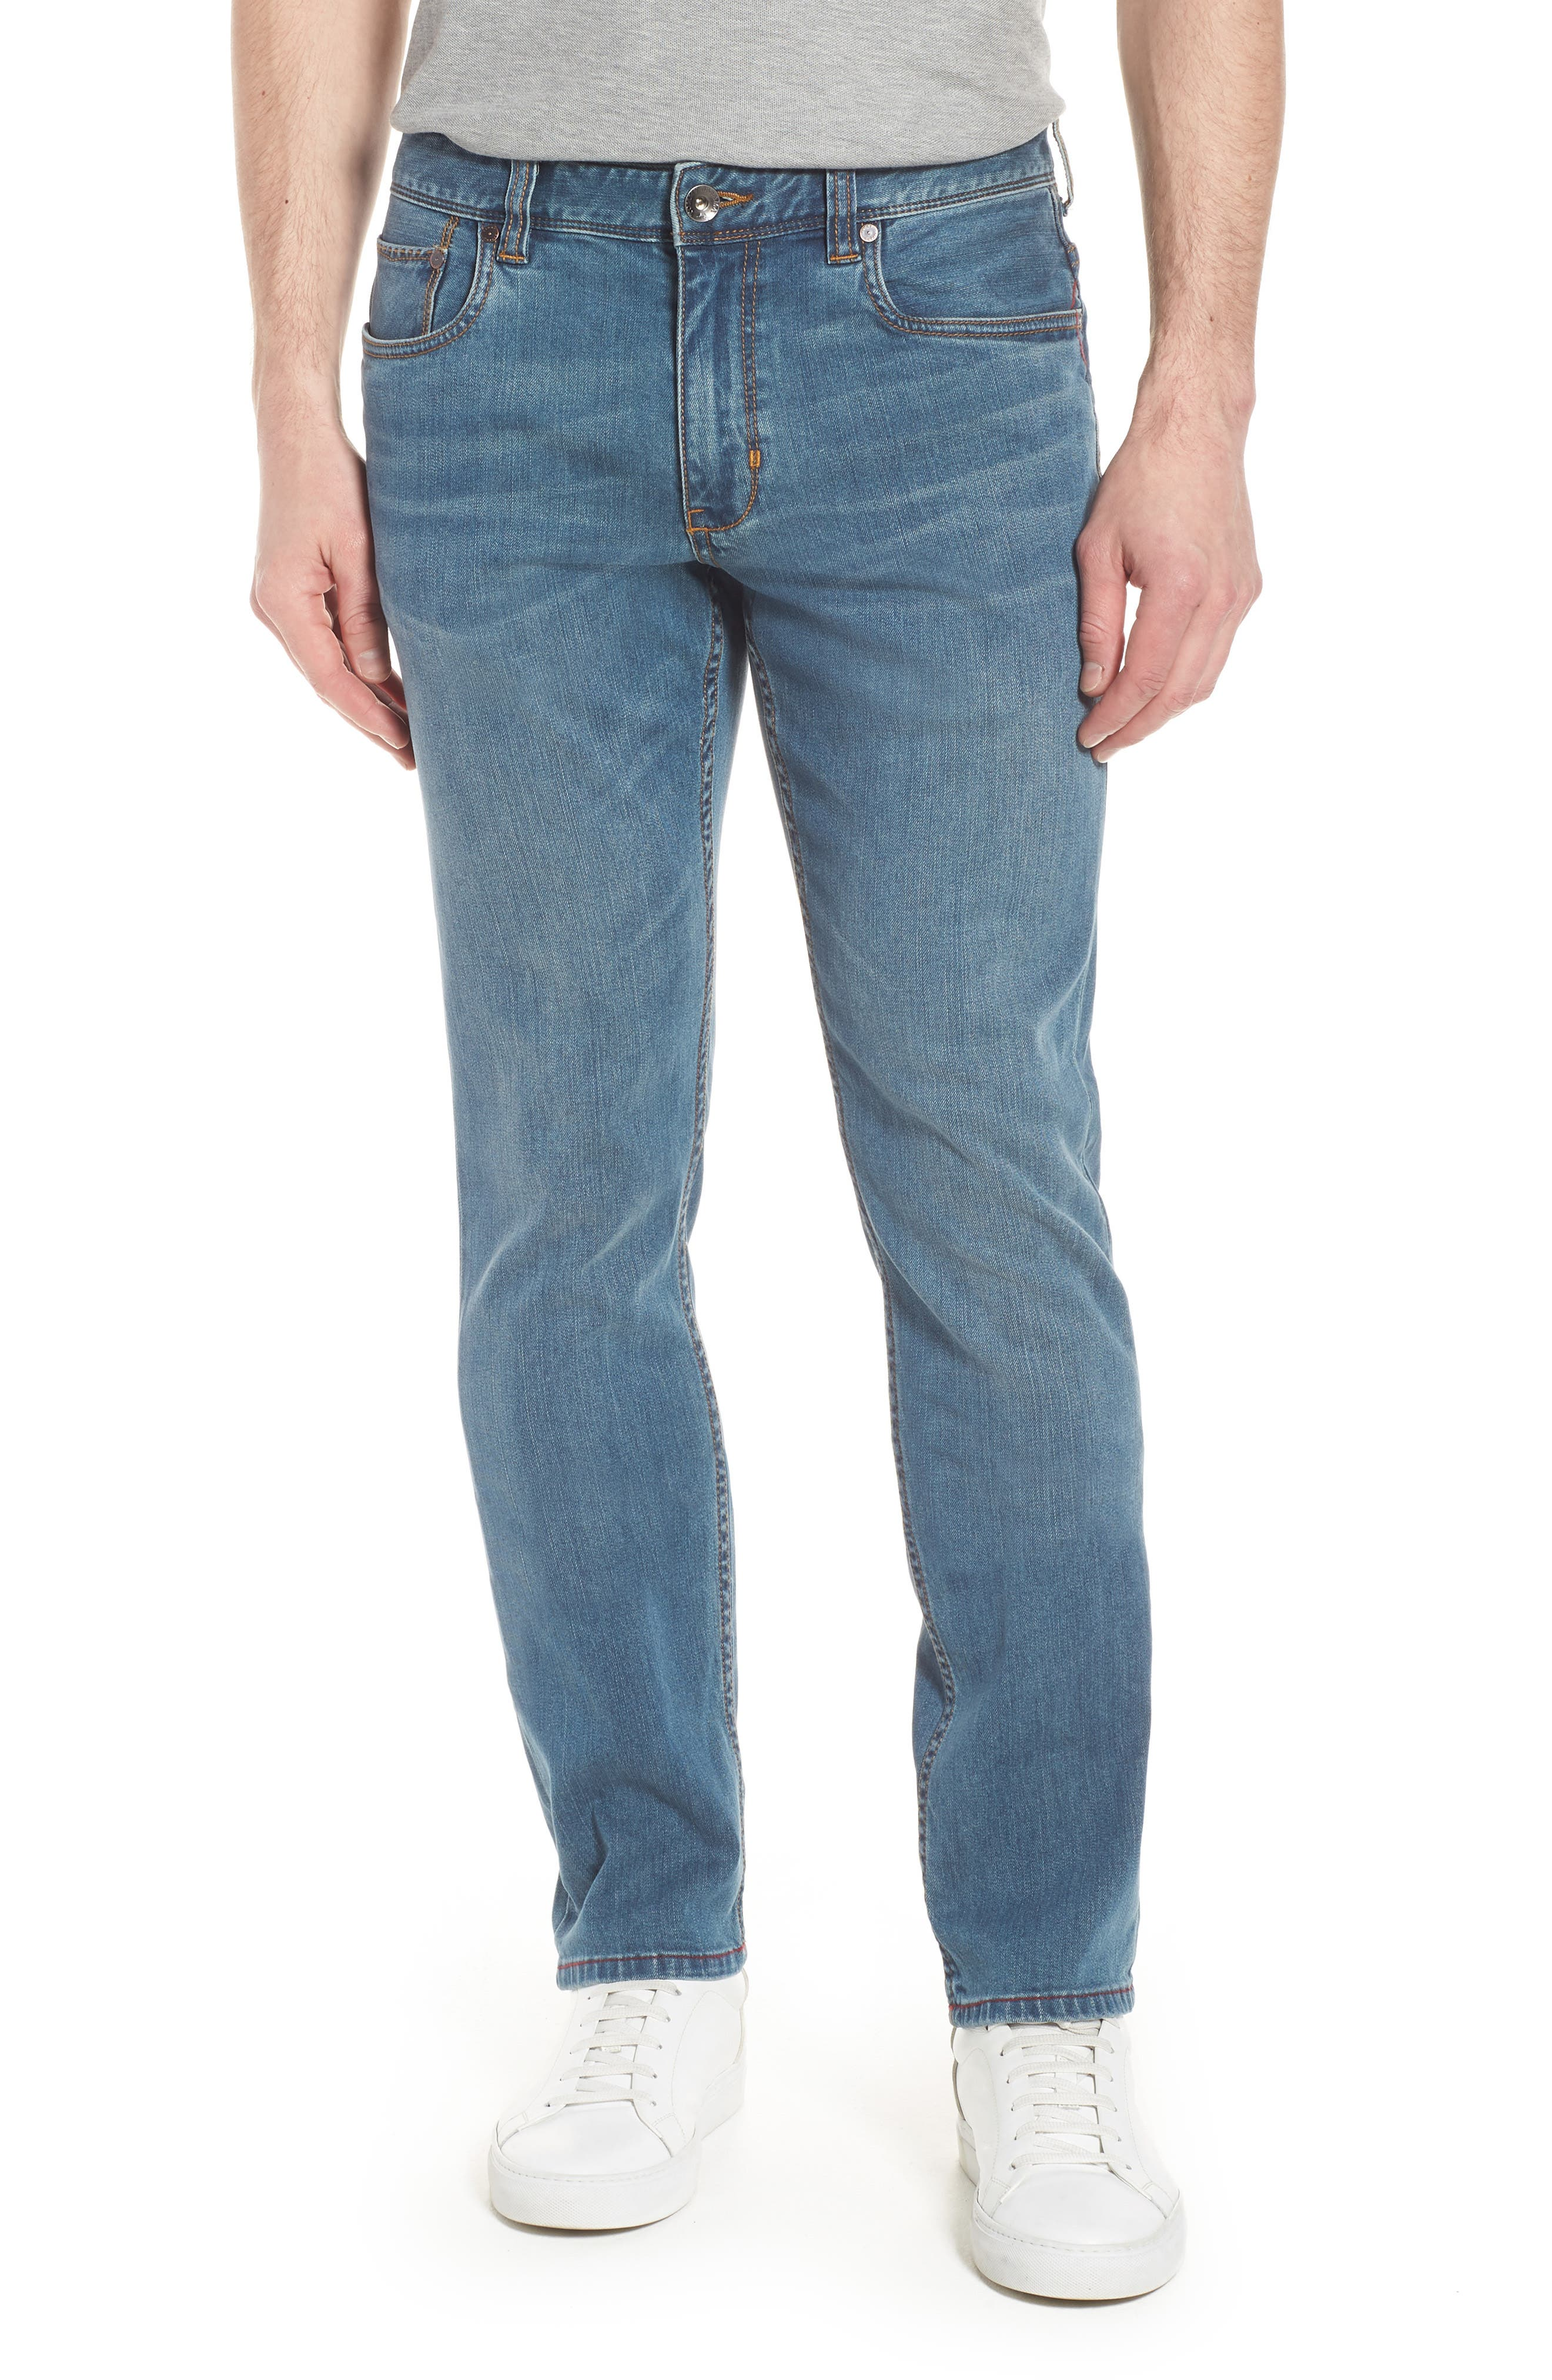 Vintage Fit Jeans,                         Main,                         color, Vintage Wash